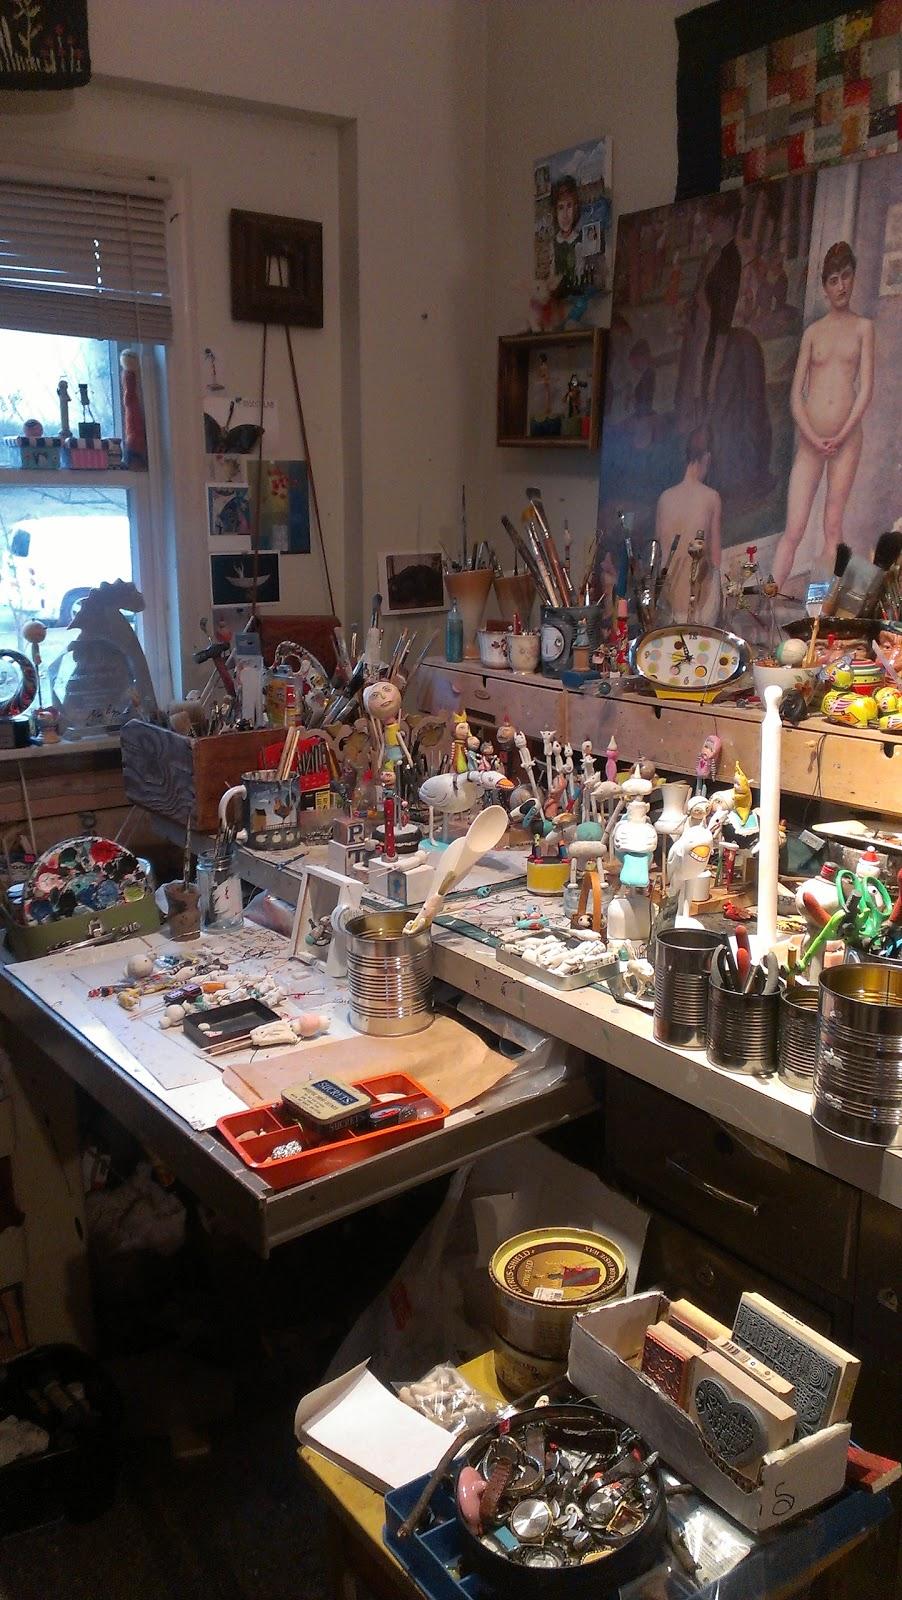 Studio To Go Makeup Case With Light: Mary-Lynne Moffatt Art: In My Studio